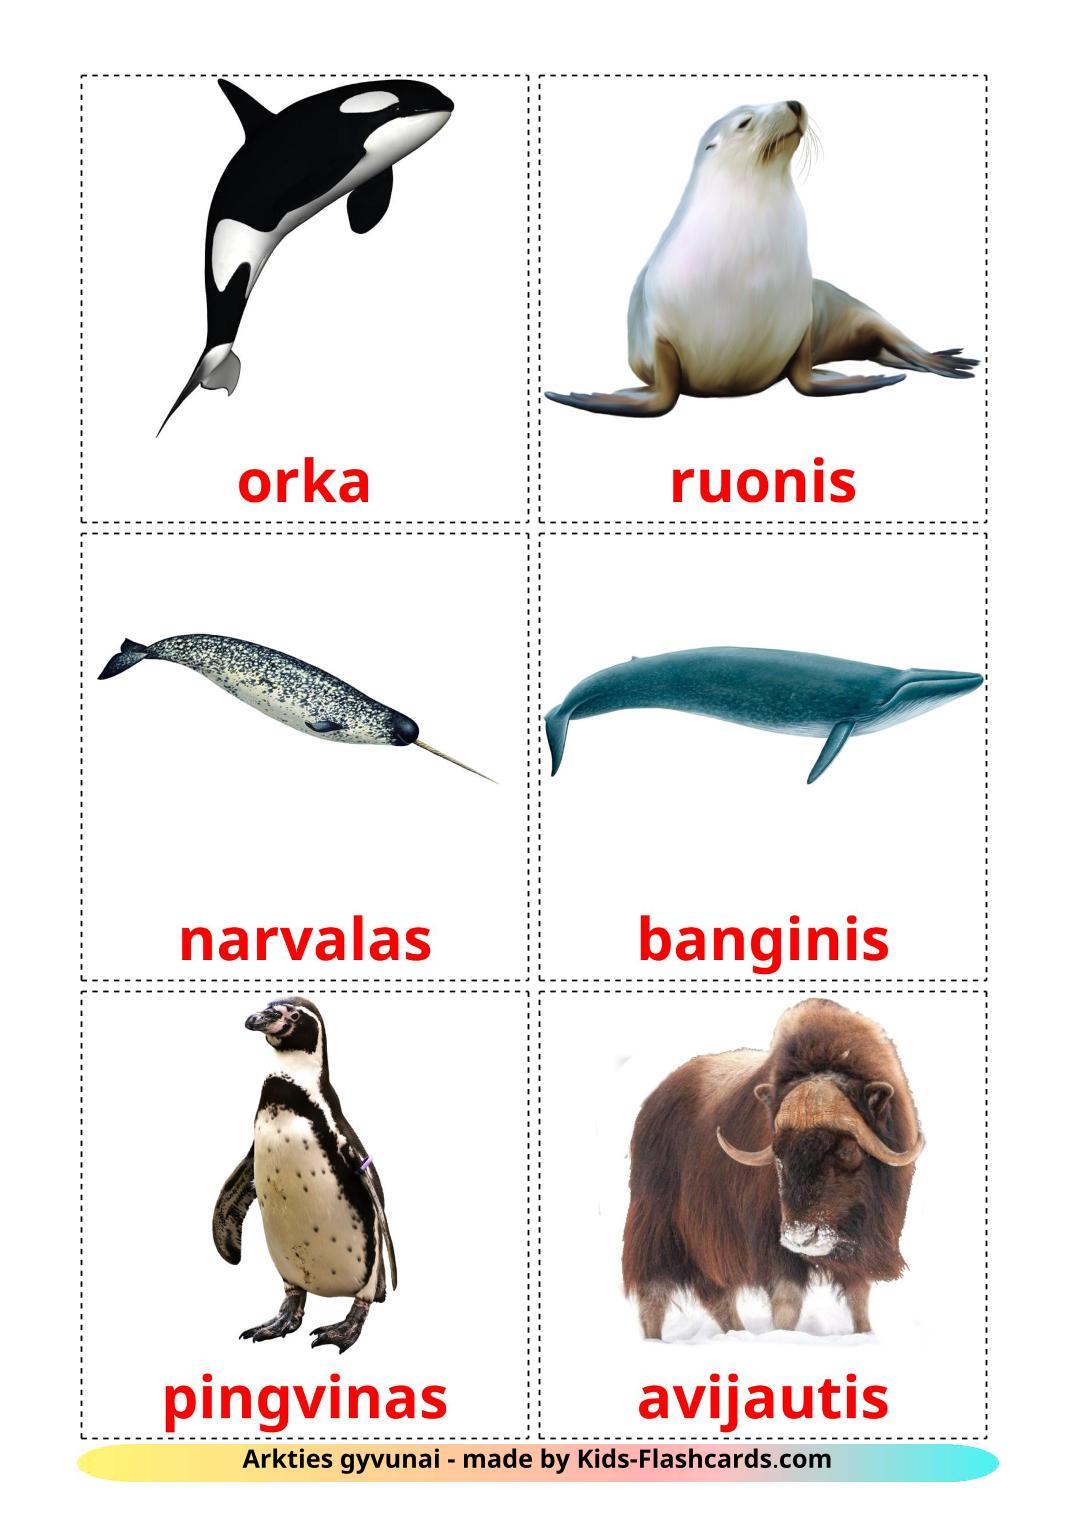 Arctic animals - 14 Free Printable lithuanian Flashcards